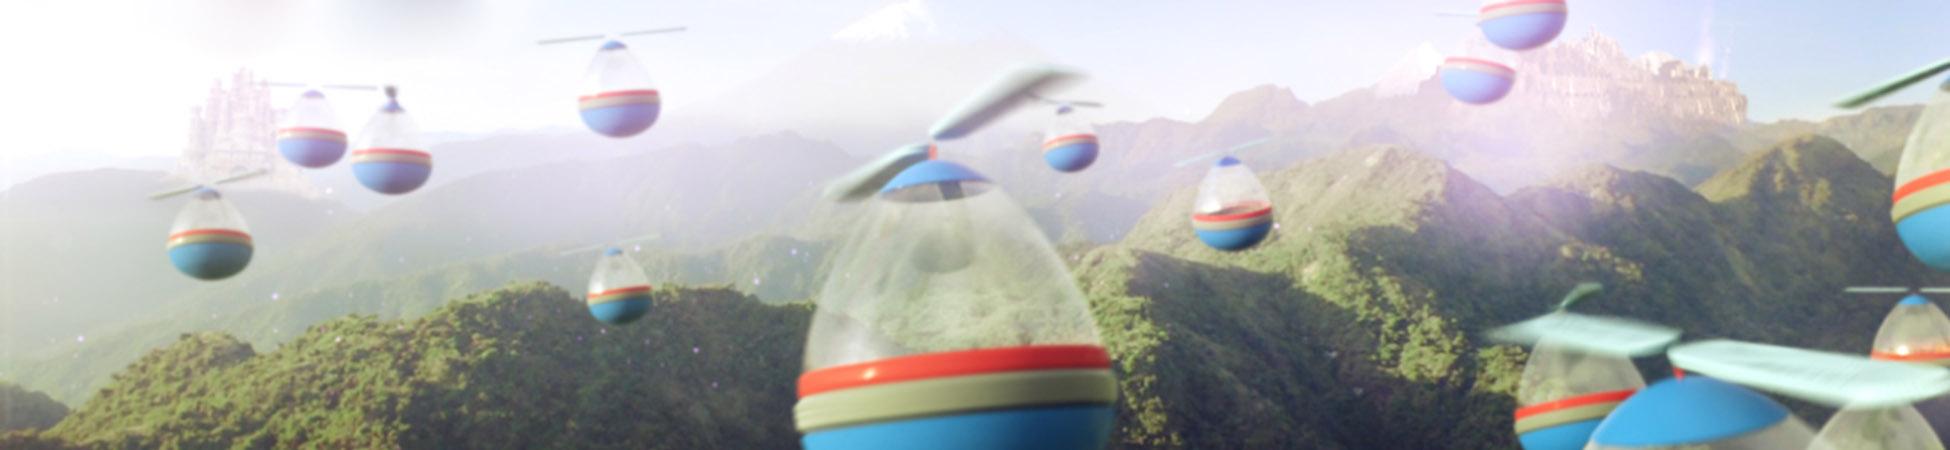 SLIDER-Planet-Earth-EP10-CUT-A-VFX-3D-0-00-08-04